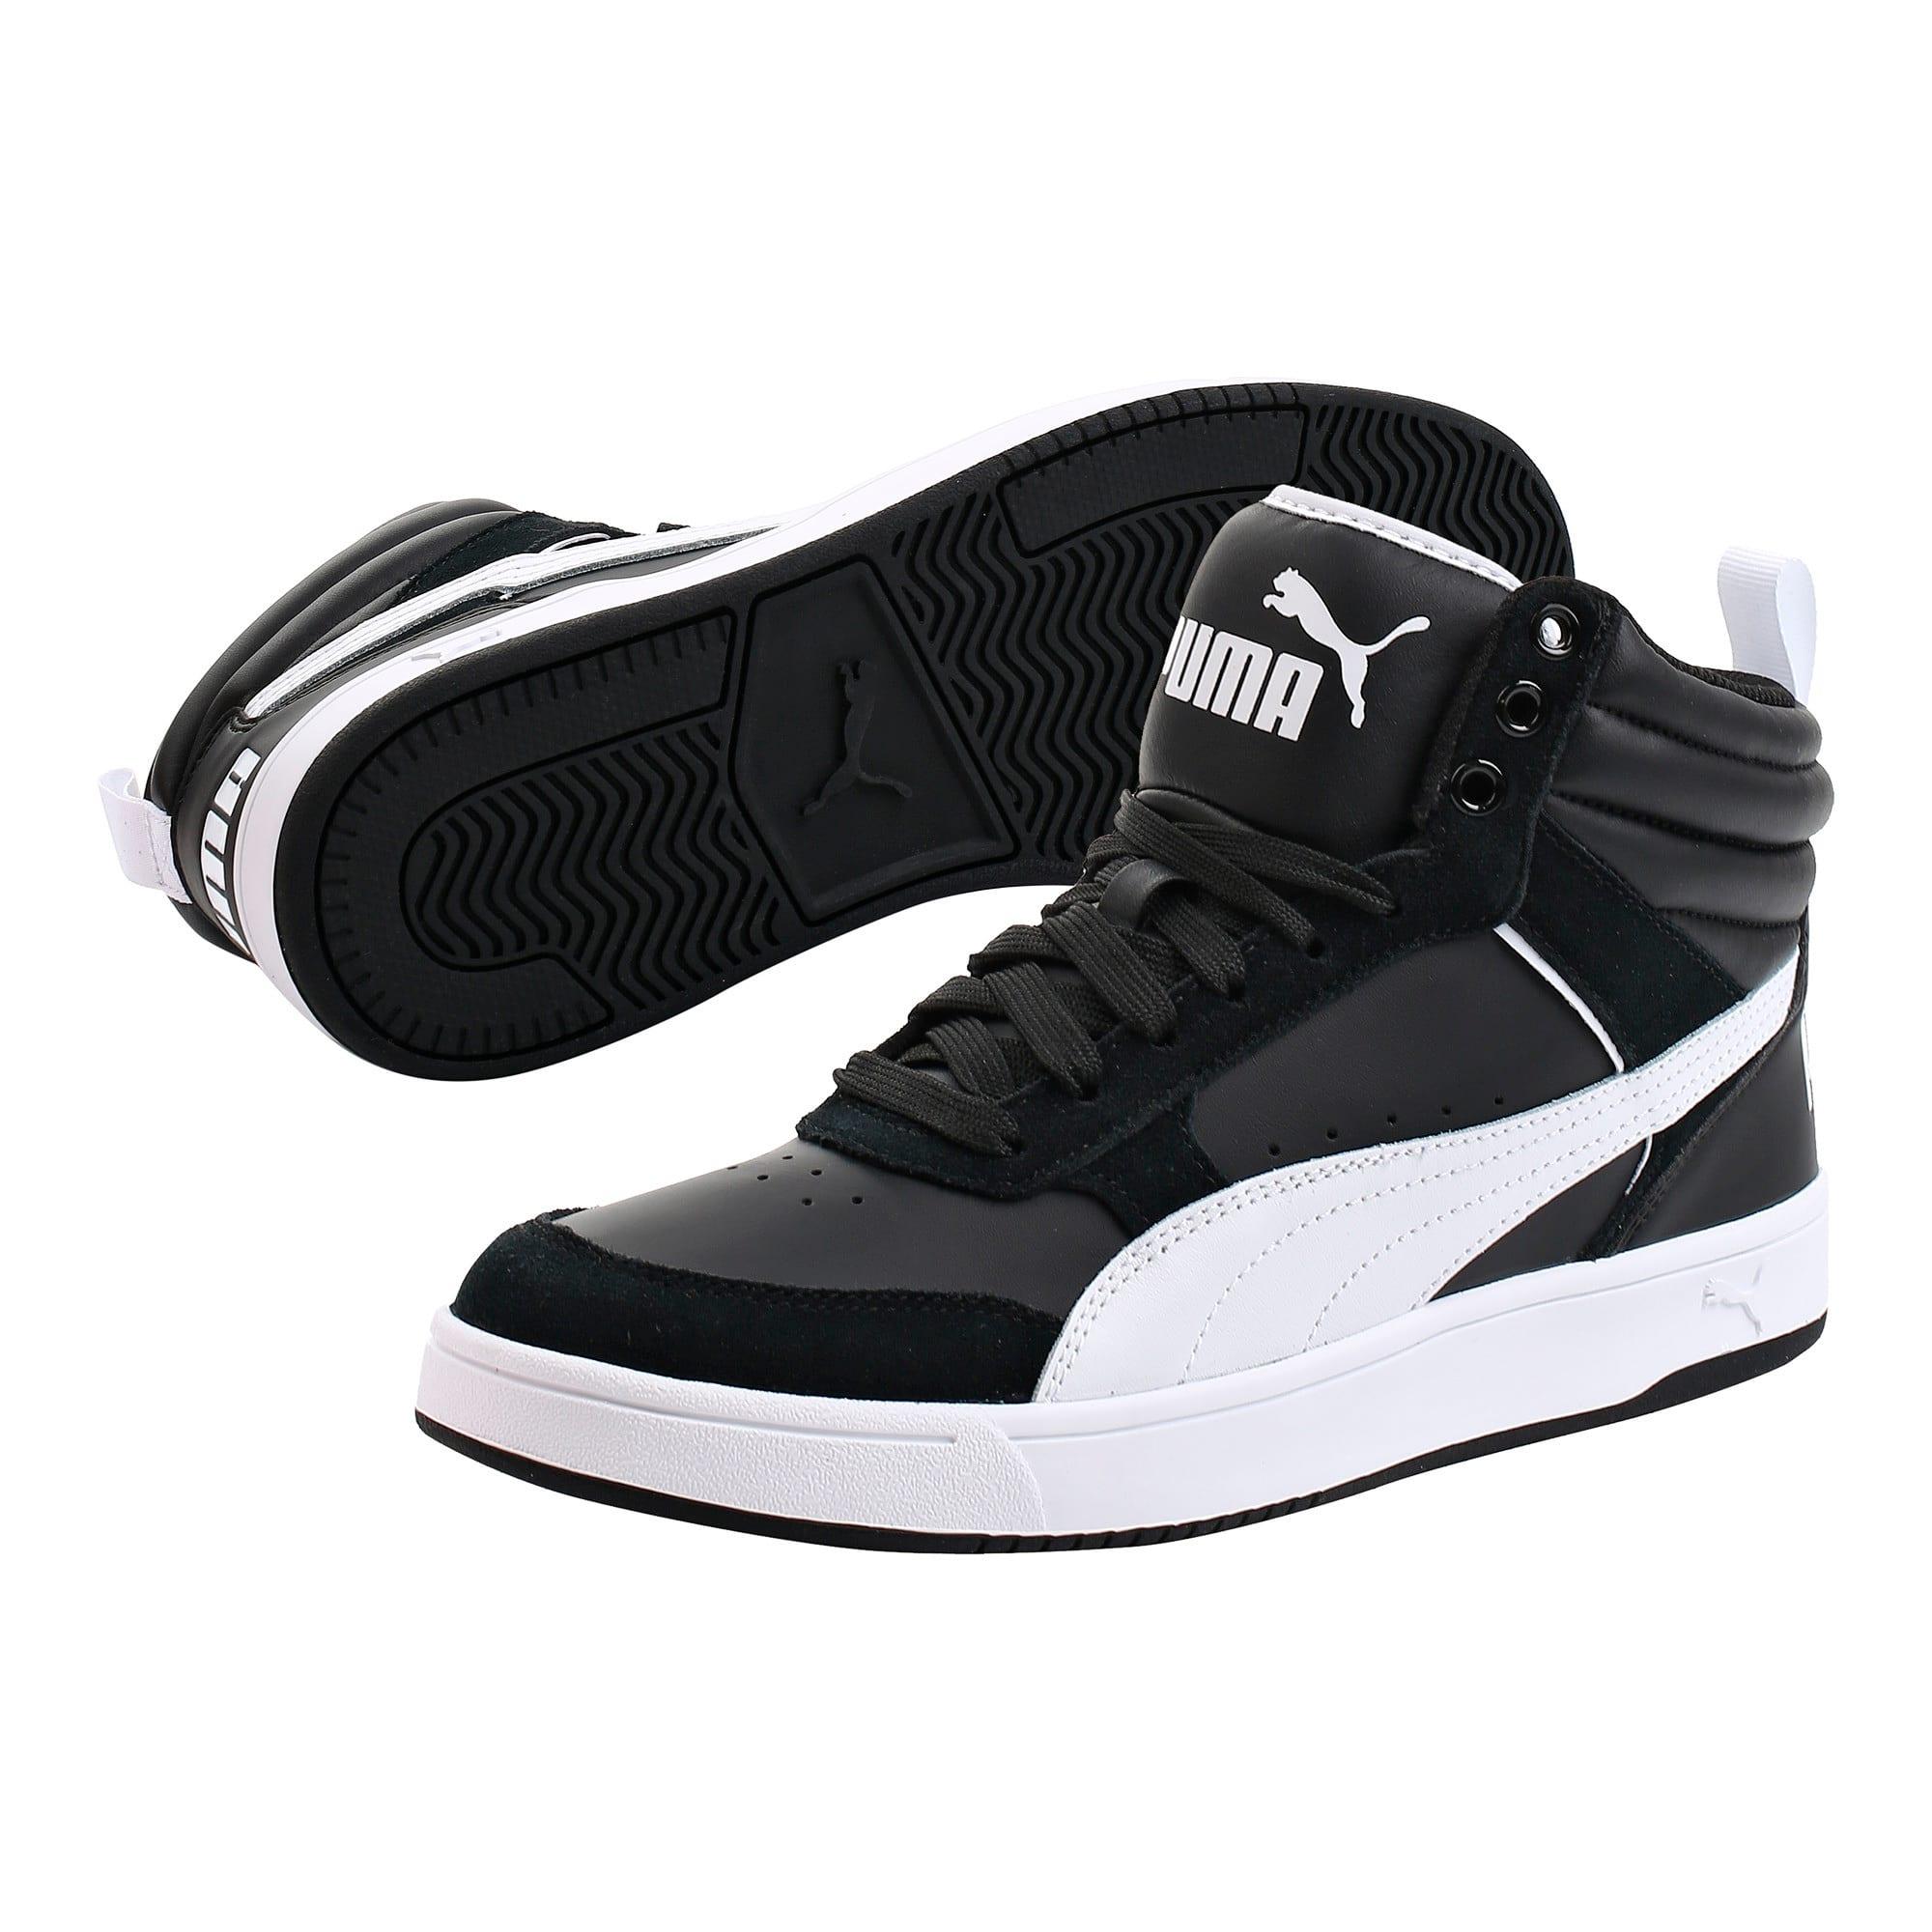 Thumbnail 2 of Puma Rebound Street v2 Sneakers, Puma Black-Puma White, medium